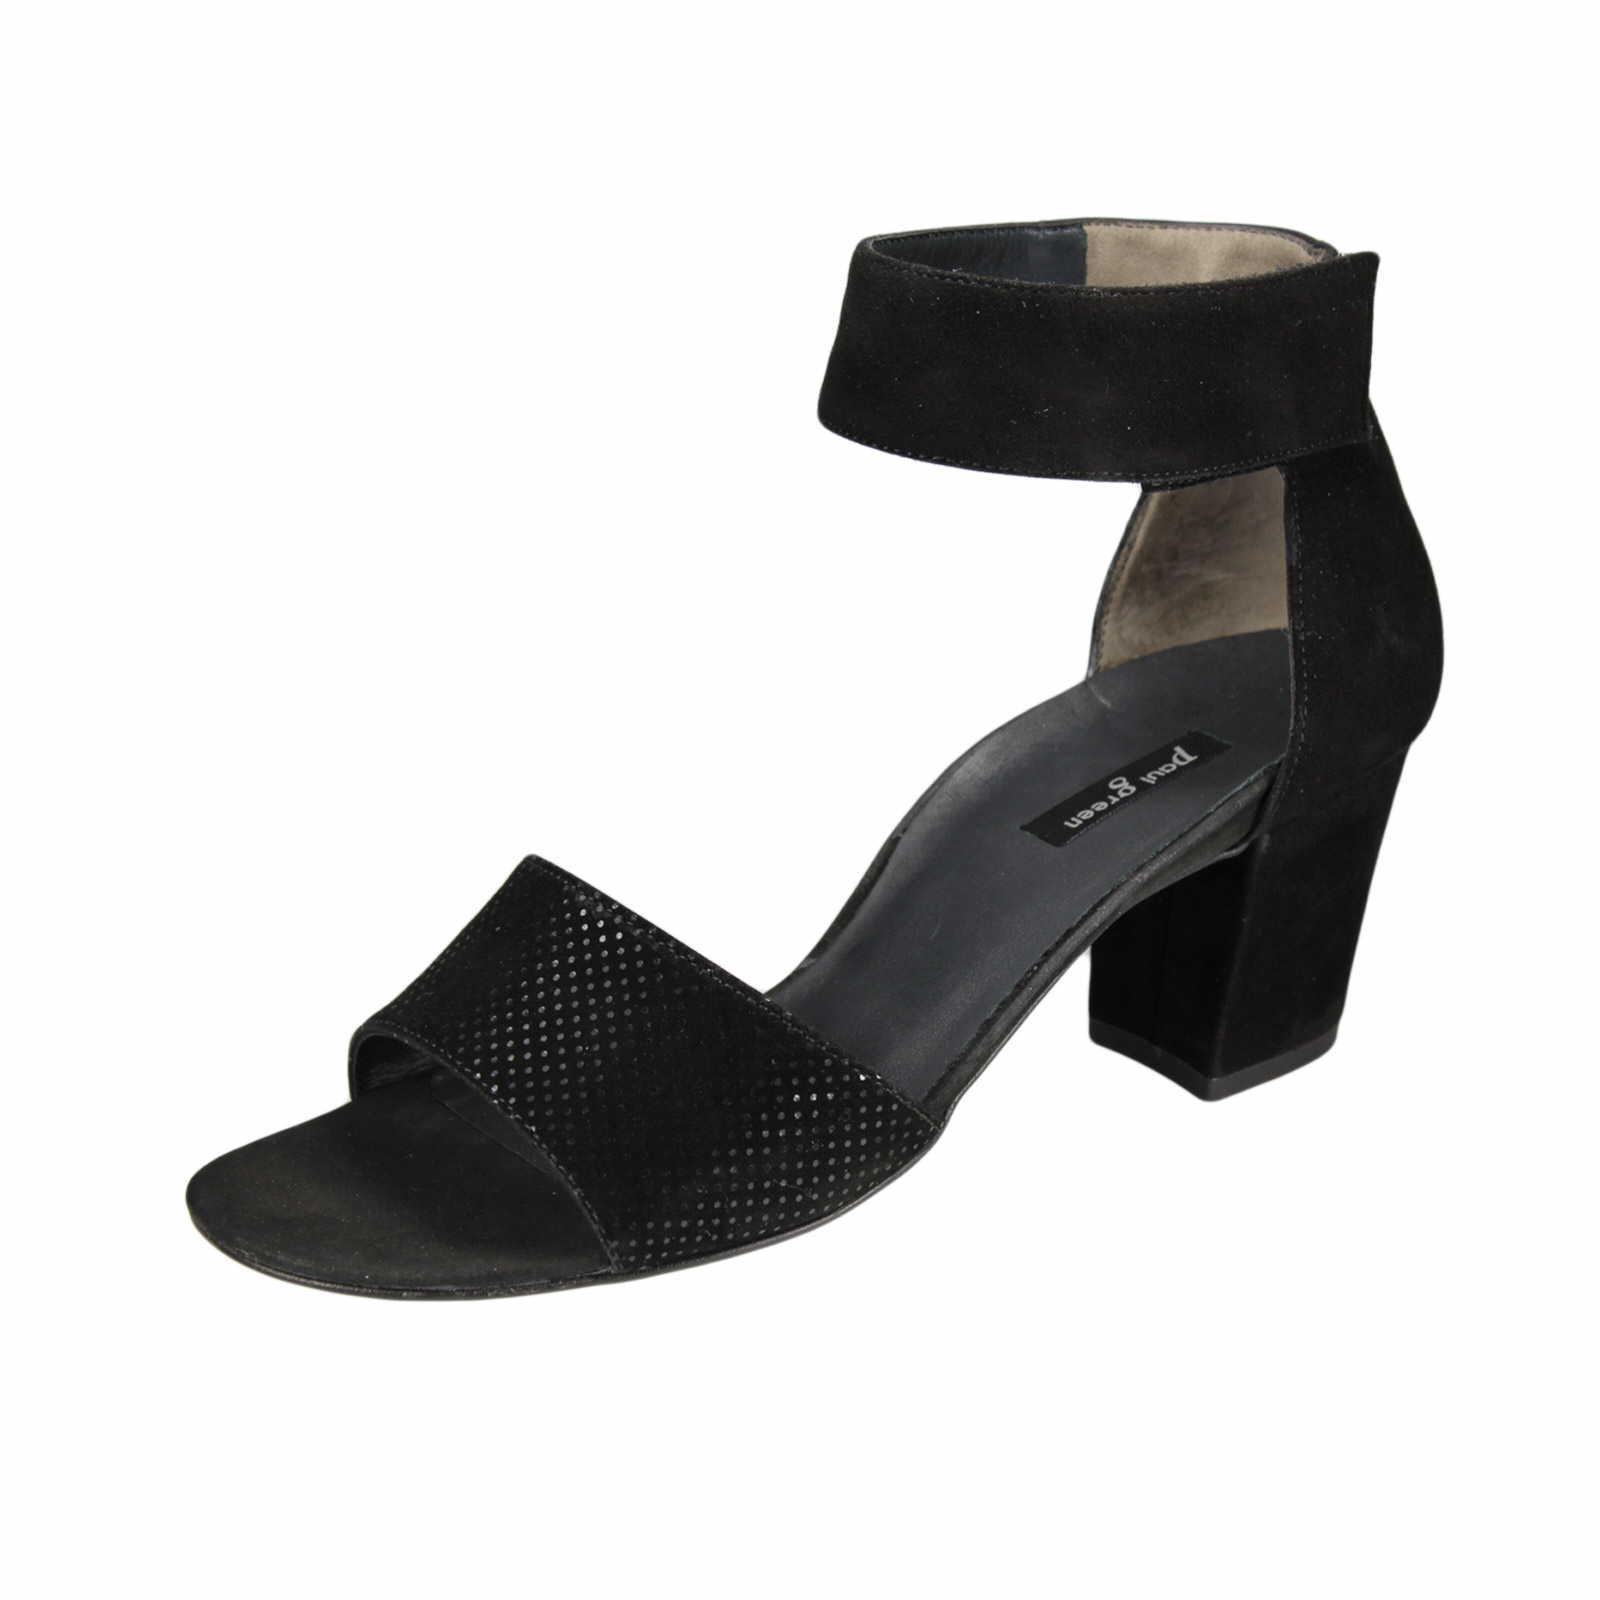 Damen Sandalette schwarz - 6608-057